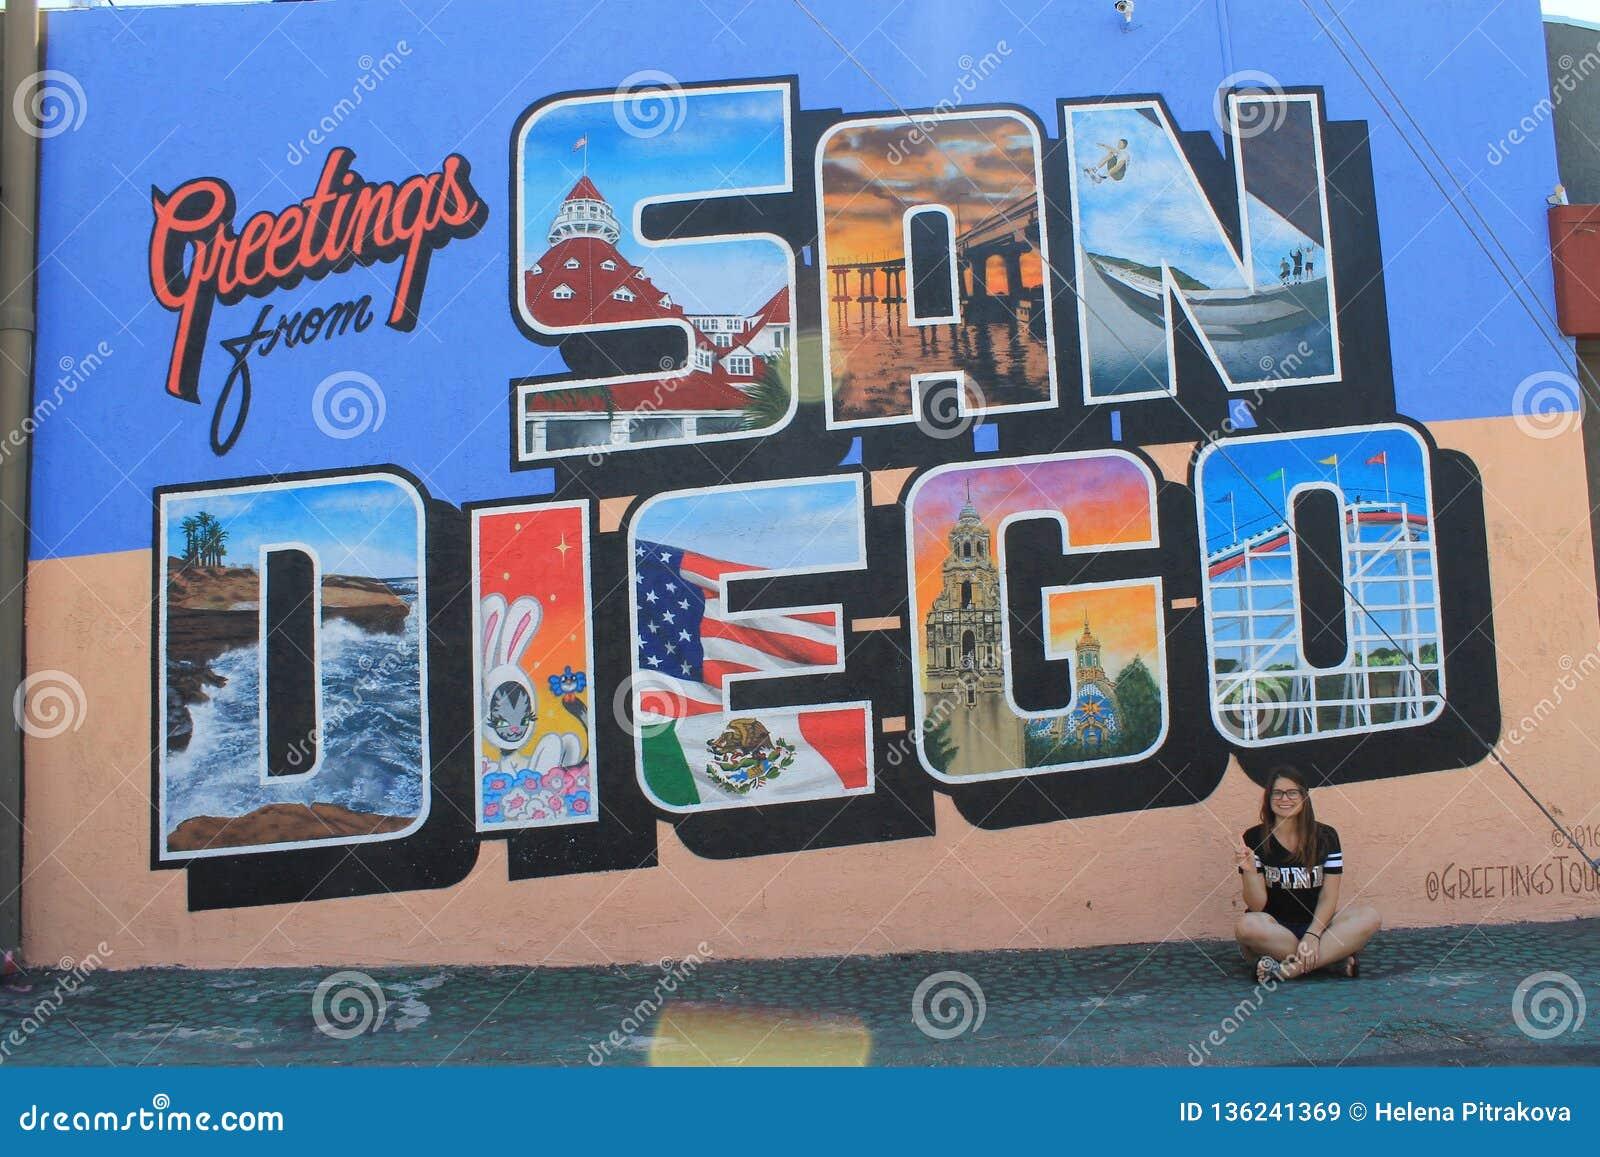 Greetings from San Diego, California, USA